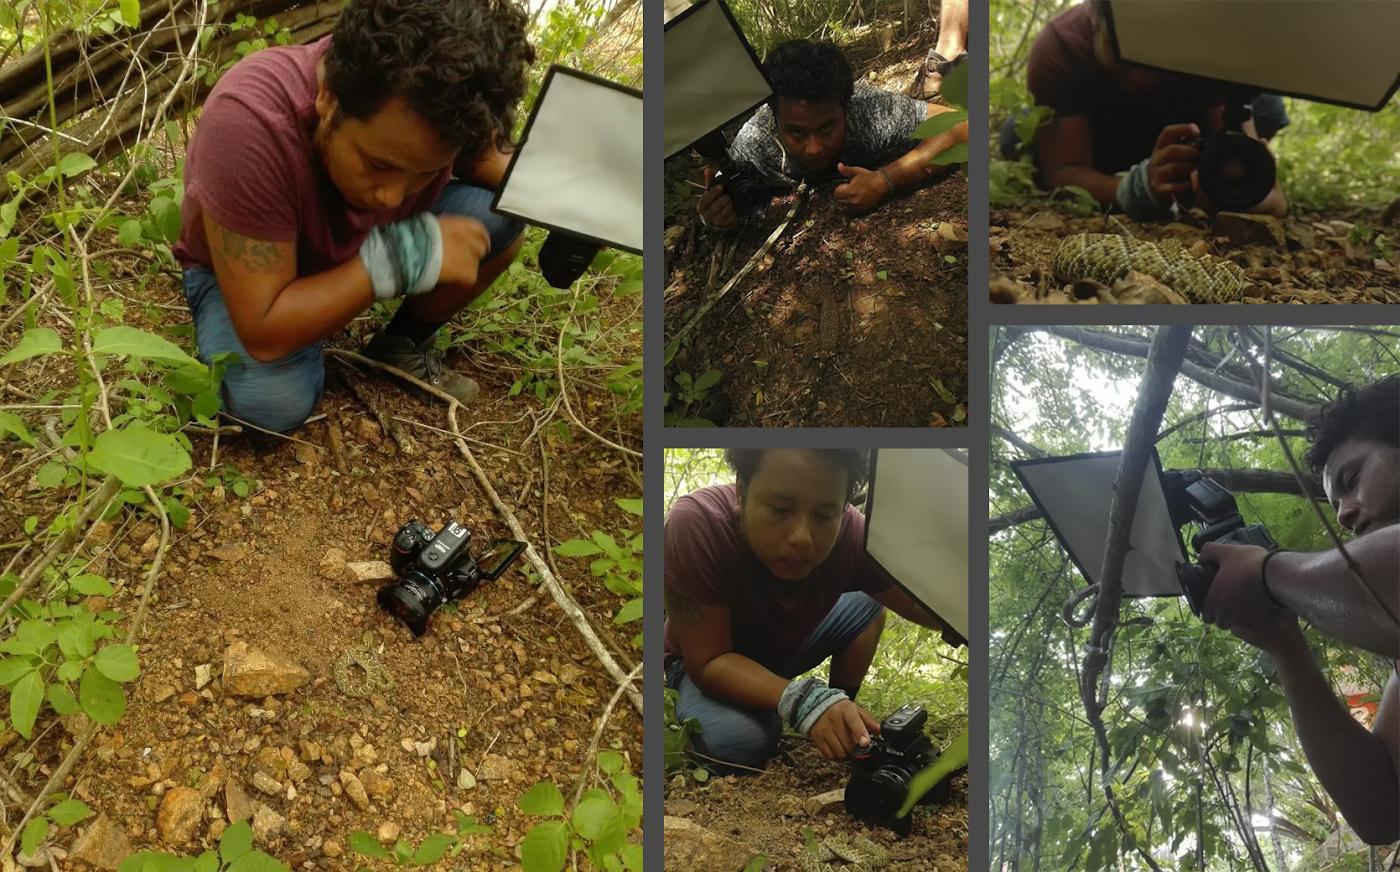 Фото 23. Как происходит фотоохота на змей с макрообъективом Laowa 15mm f4 1:1 Macro. Тушка Nikon D5600 + радиосинхронизатор + внешняя вспышка.